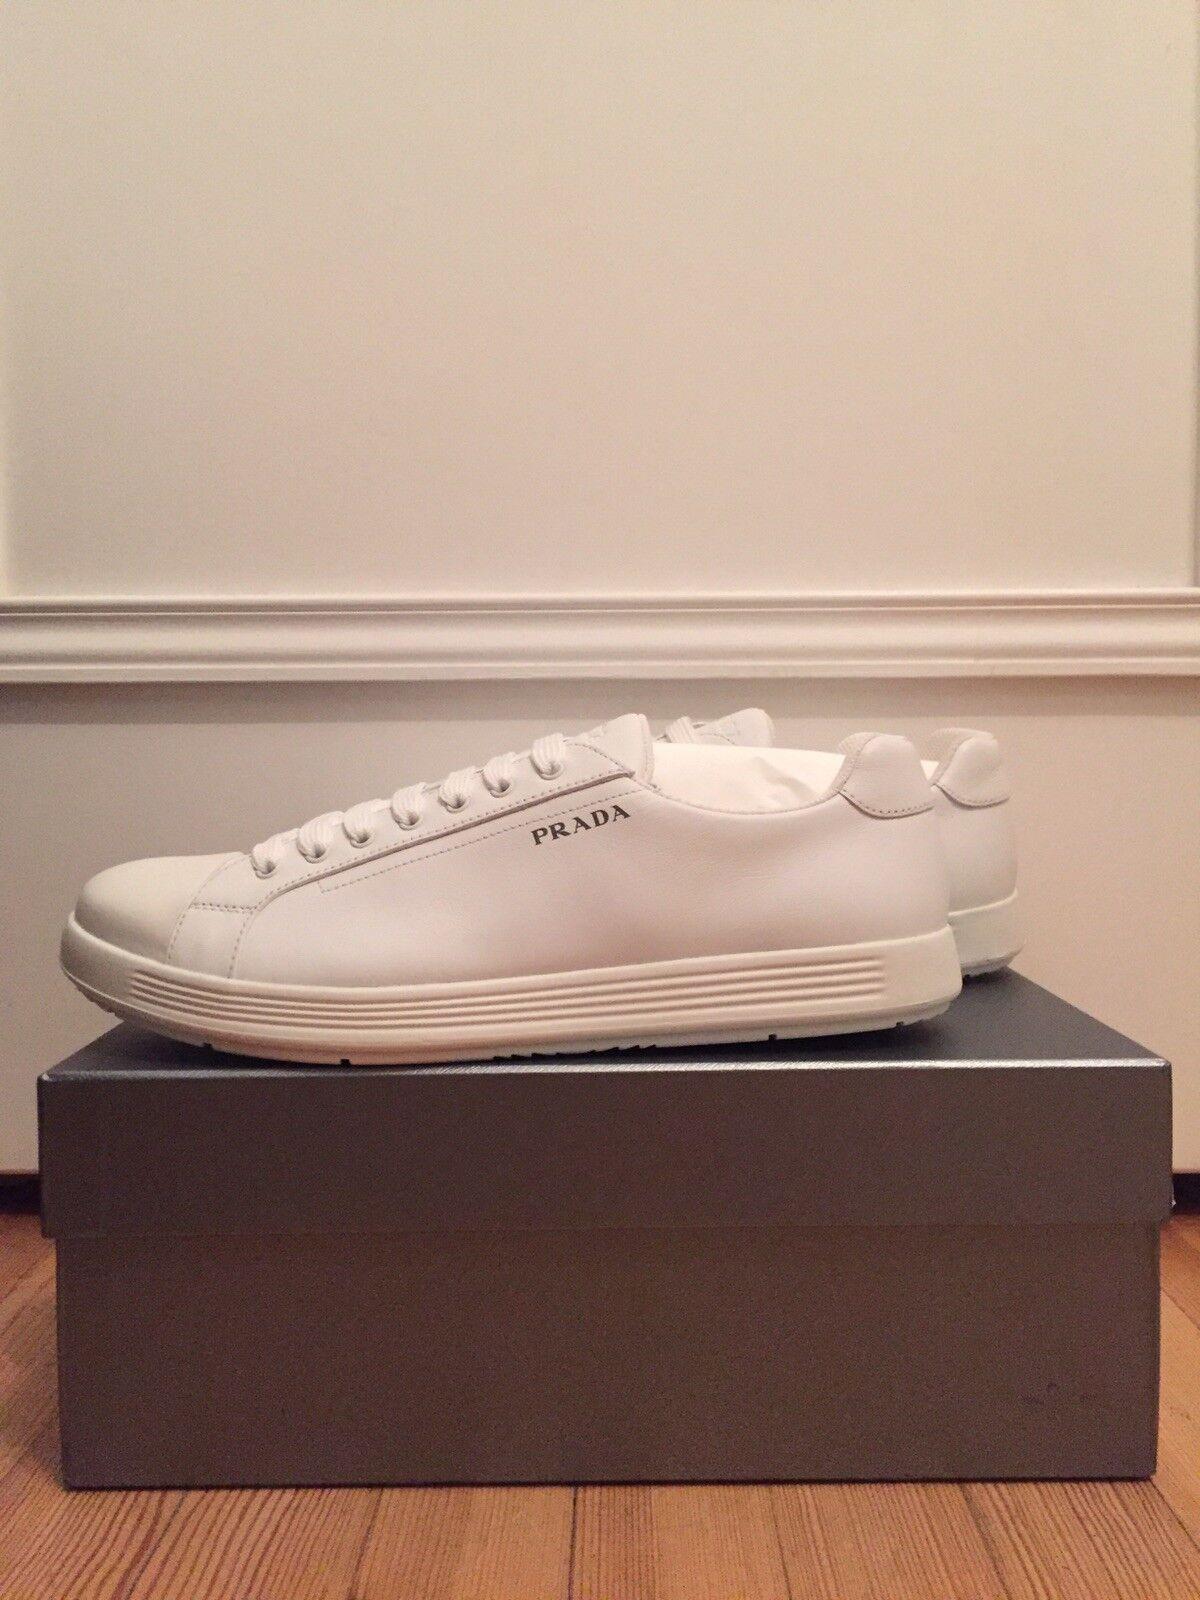 Sneaker 44 von Prada NEU   395,-